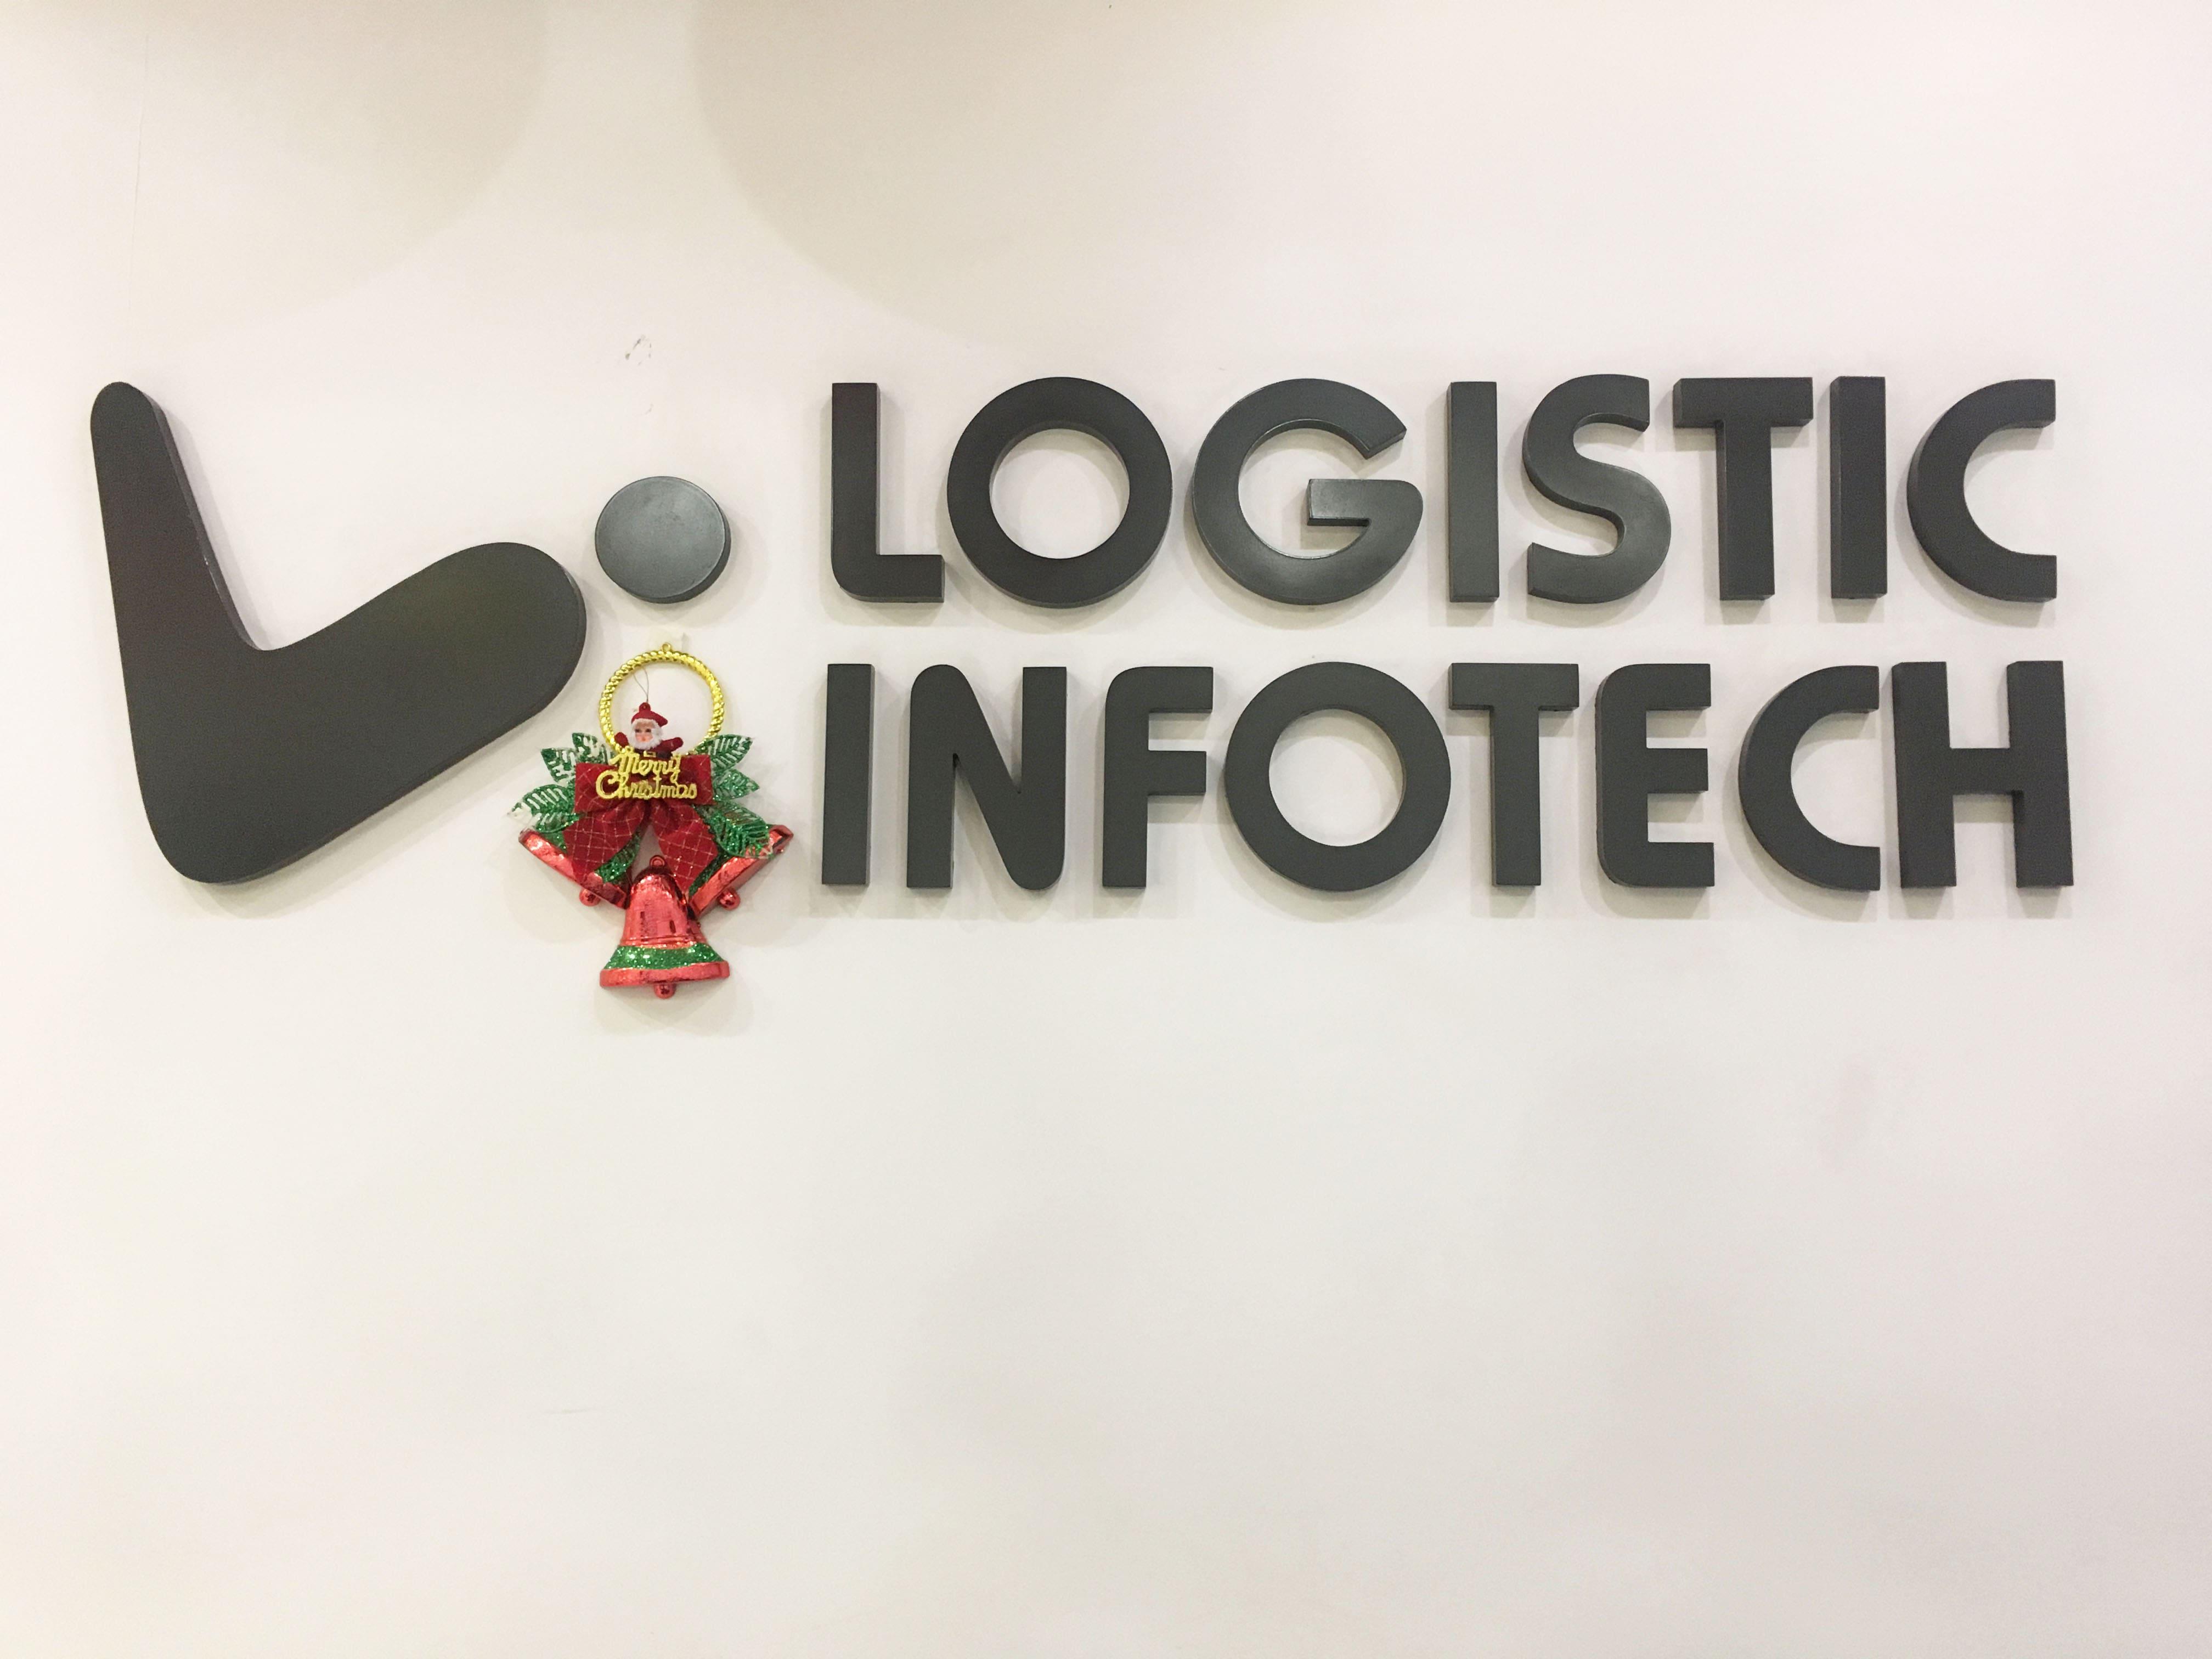 Christmas Celebrations at Logistic Infotech